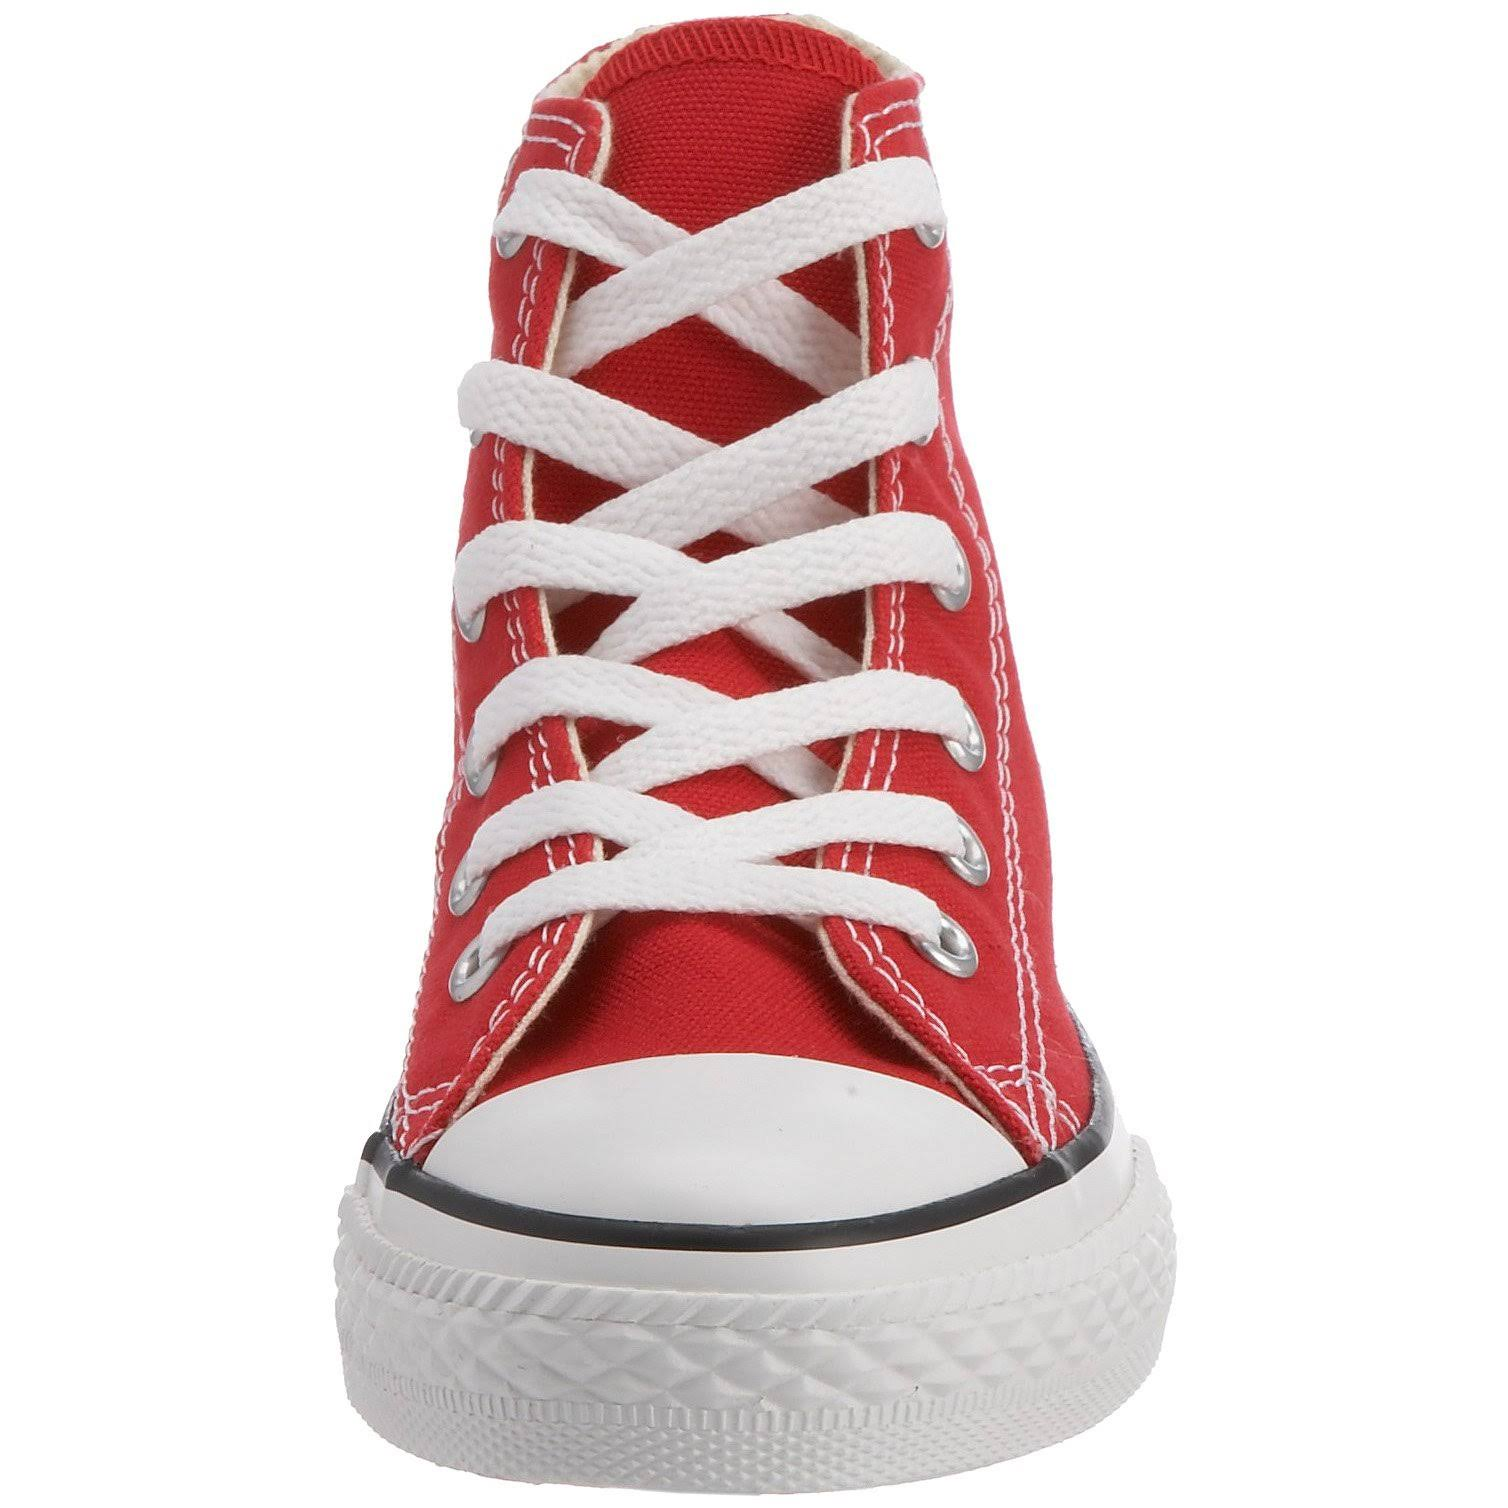 Star Red Hi Top Chuck All Taylor Converse Kids iZPXku